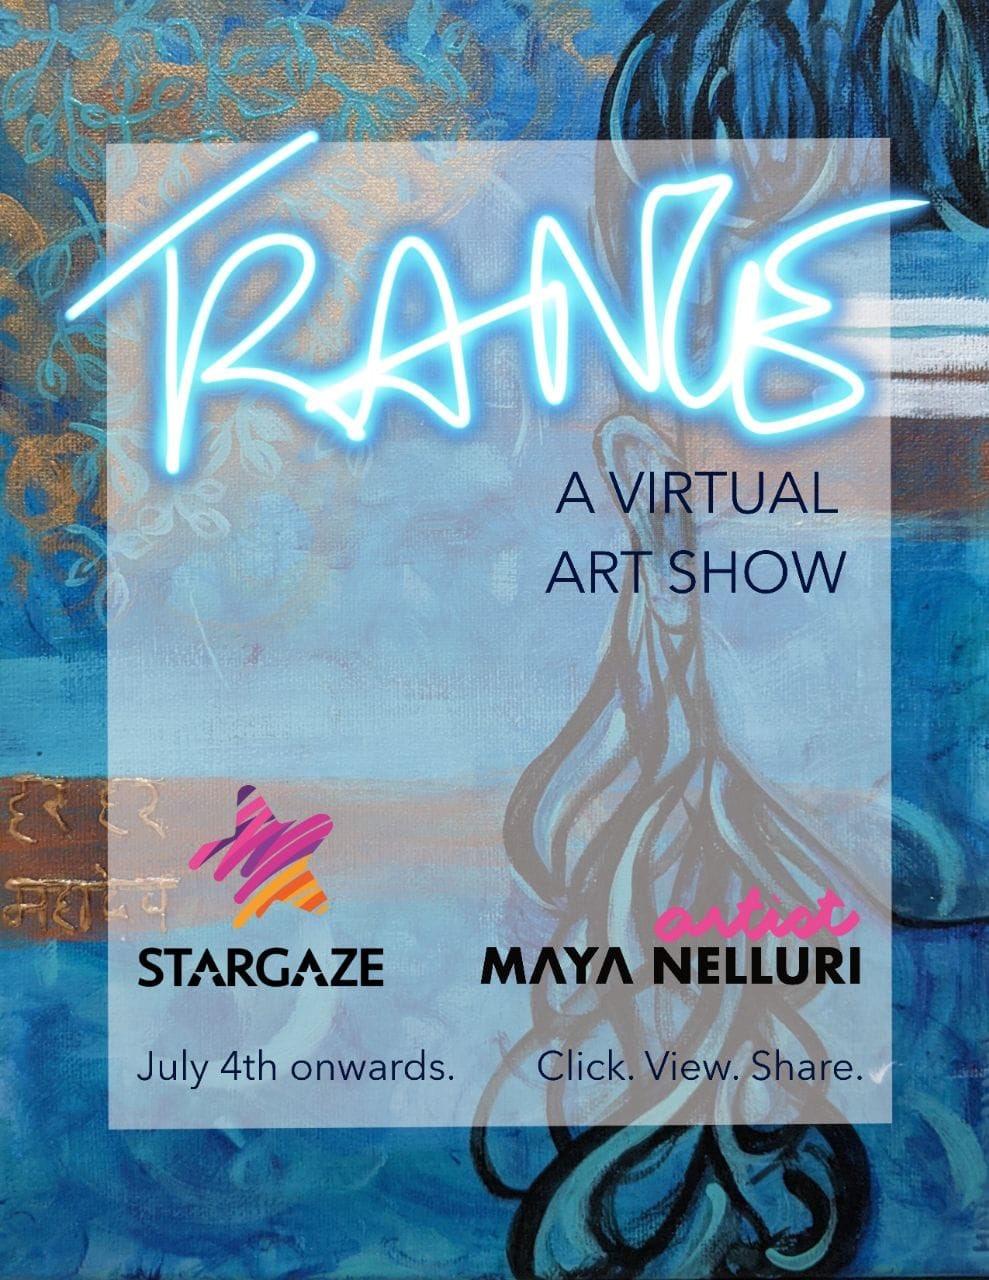 Actor VISHAL launches TRANCE Virtual Art Show